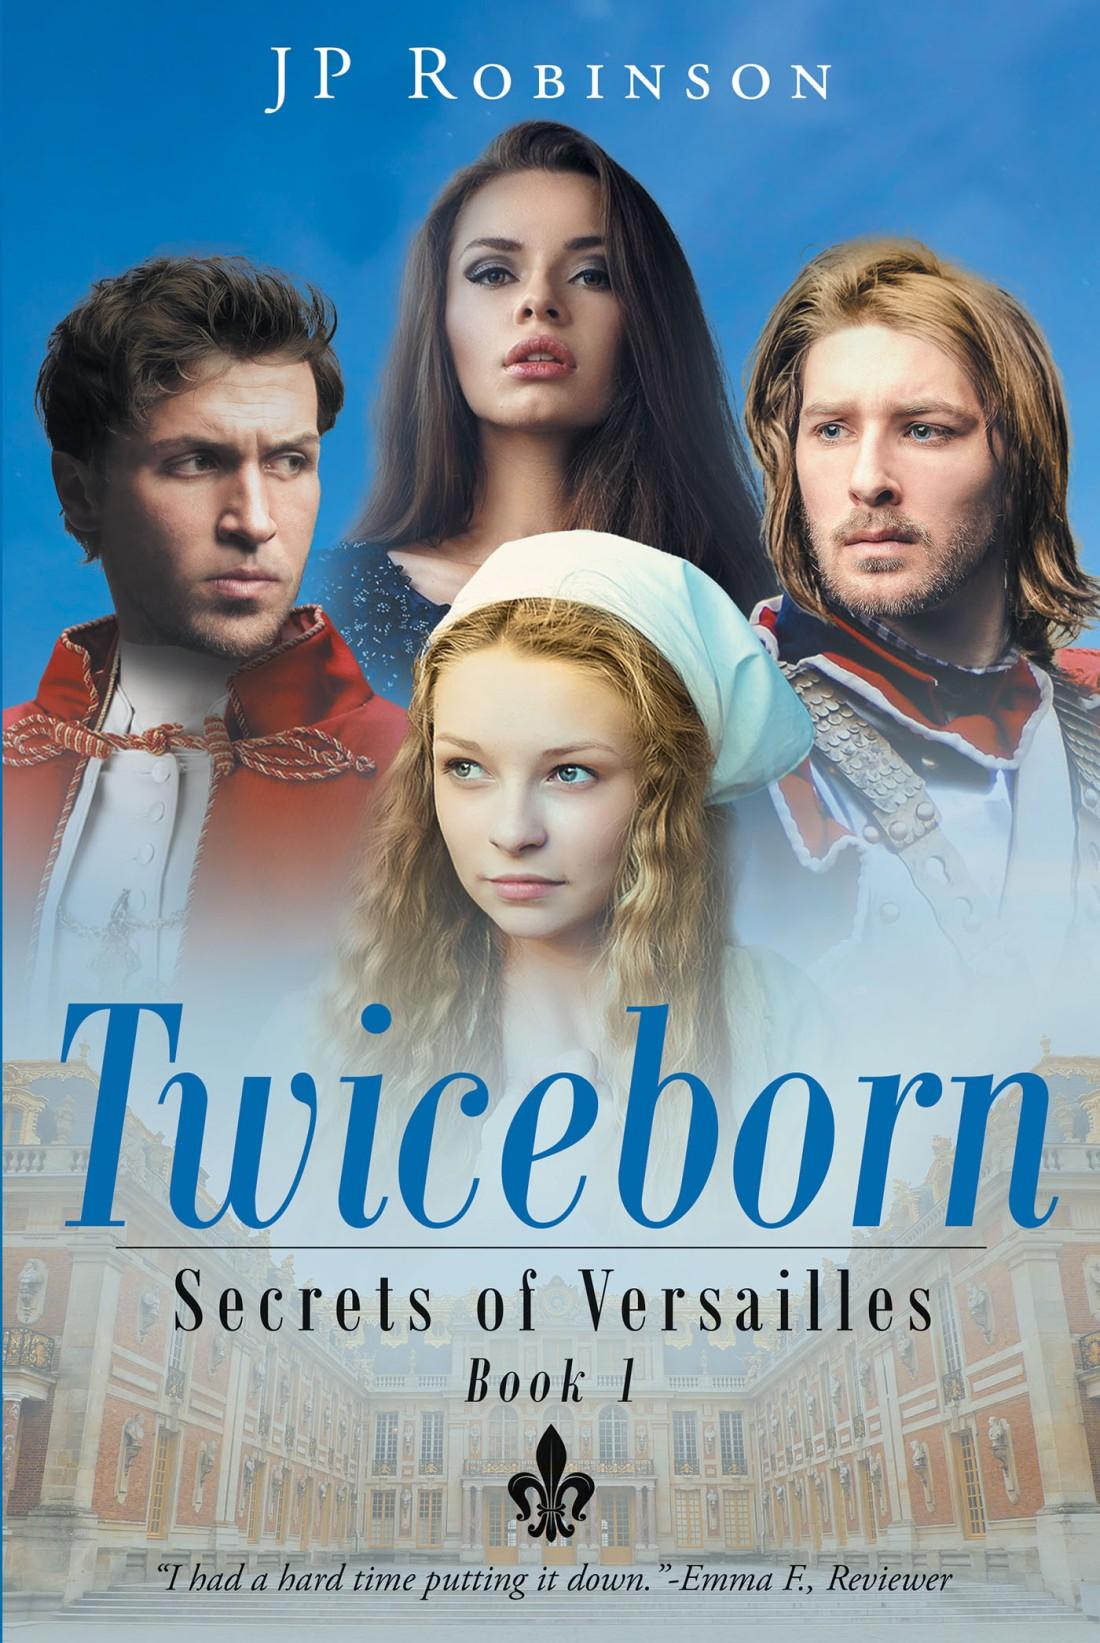 Read Twiceborn by JP Robinson